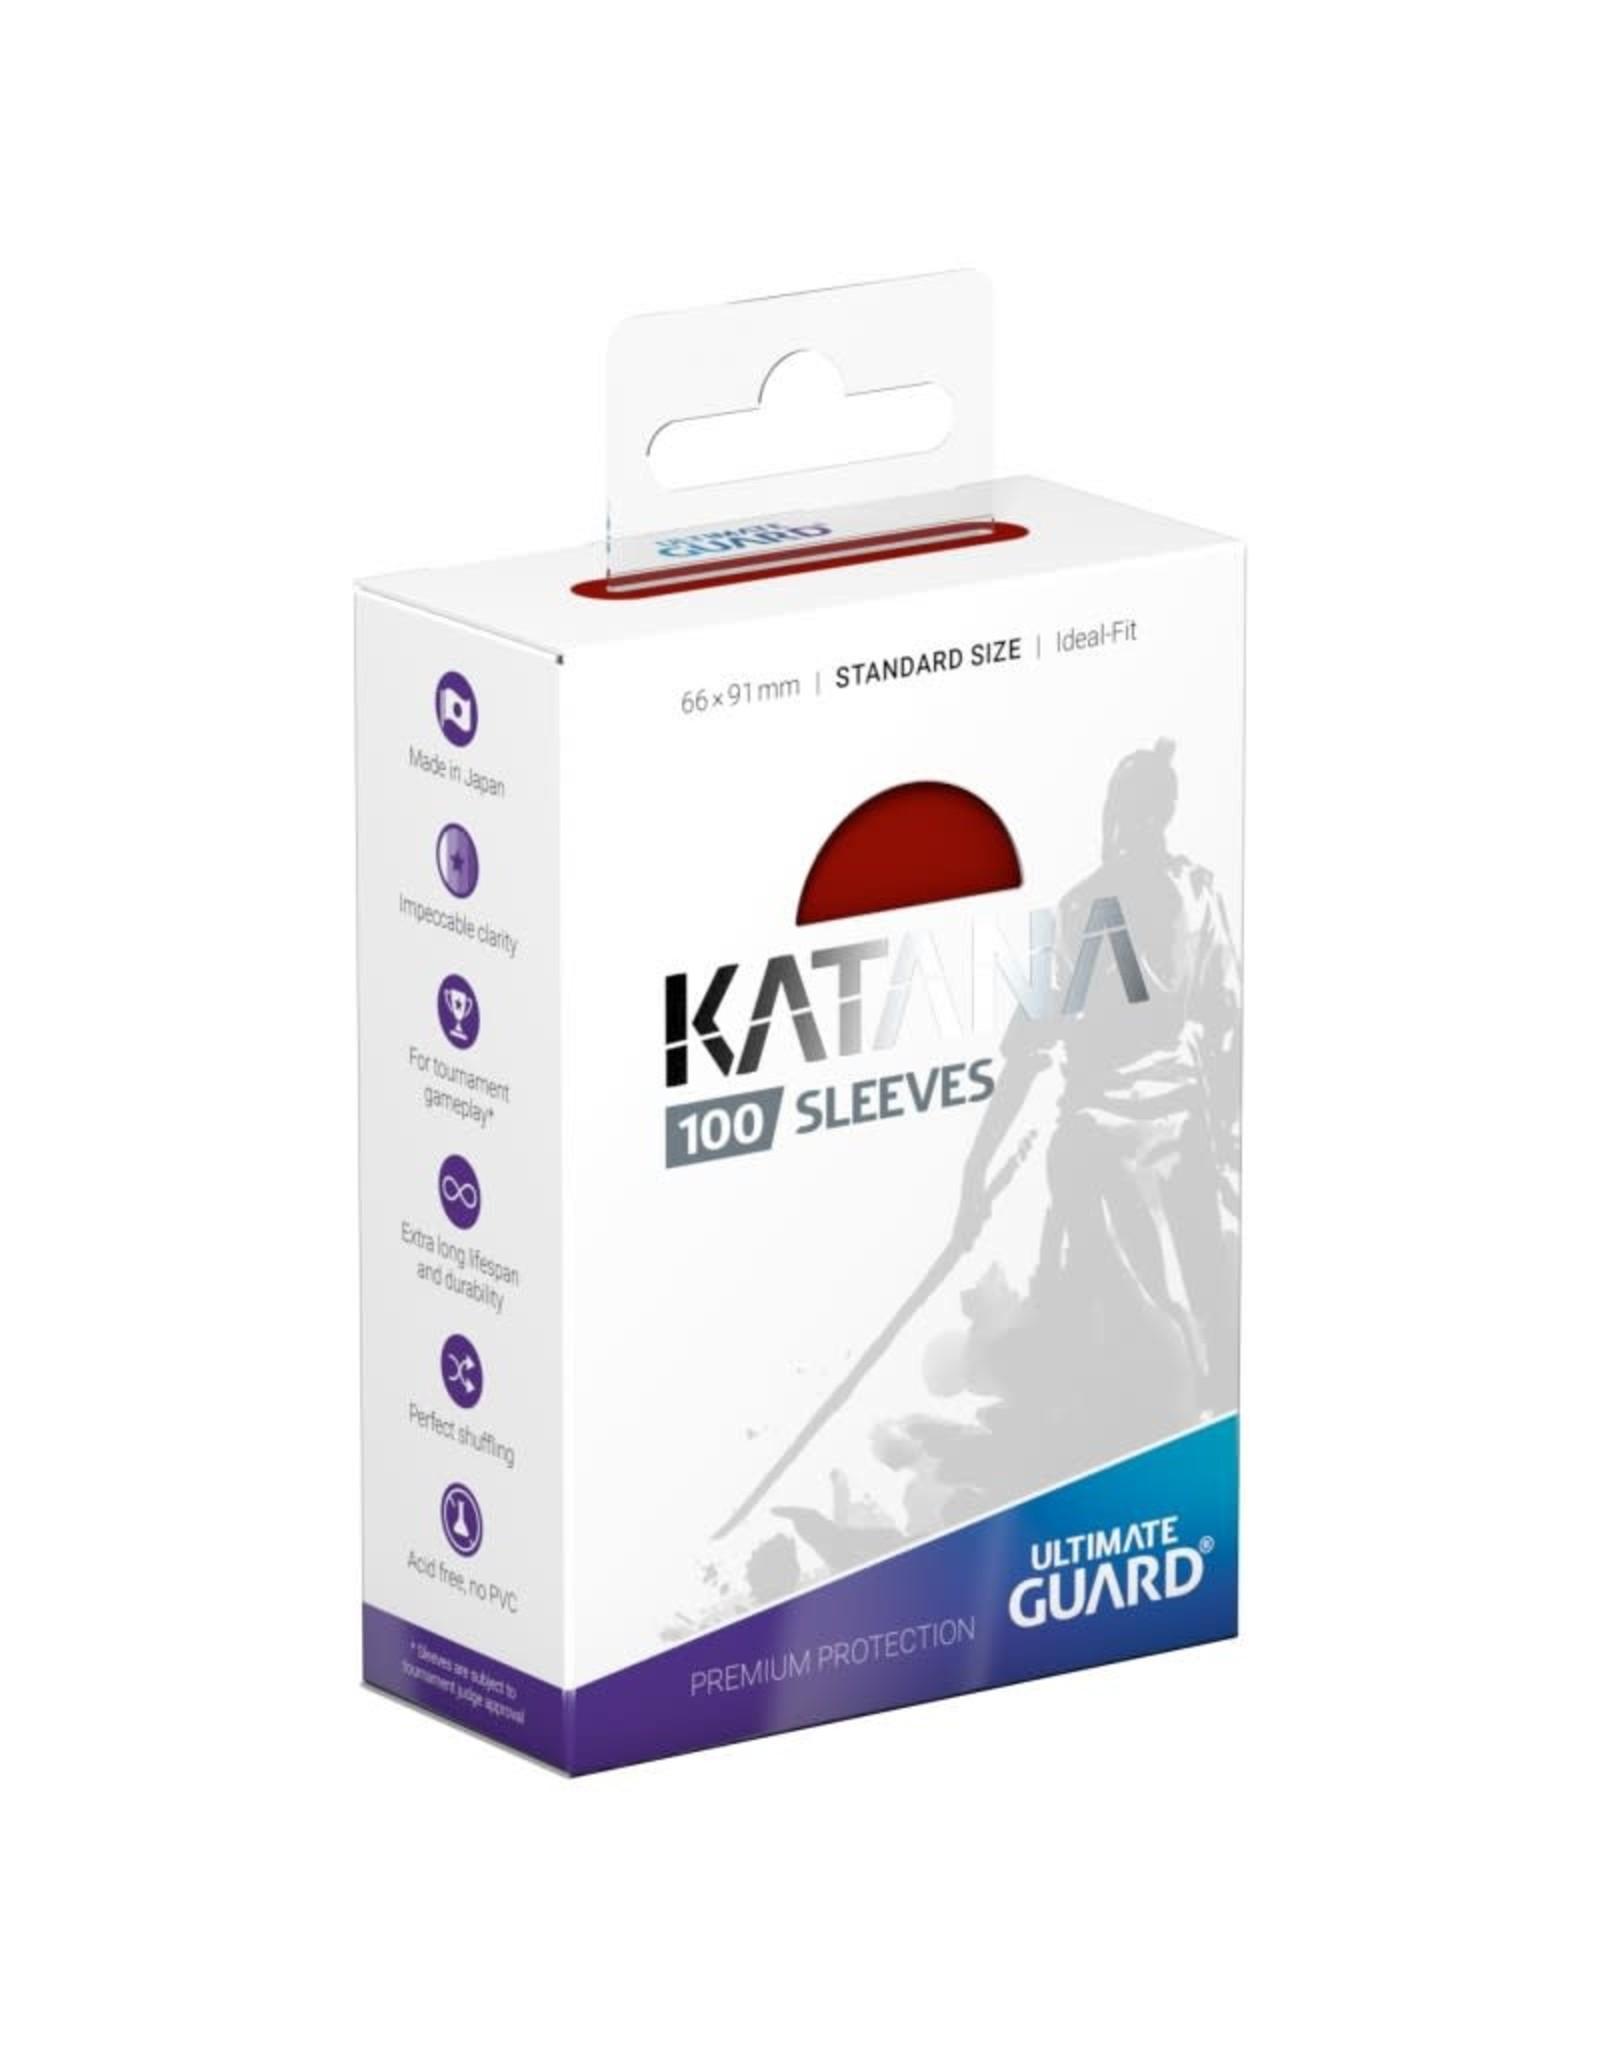 Ultimate Guard Katana Sleeves: 100ct Red